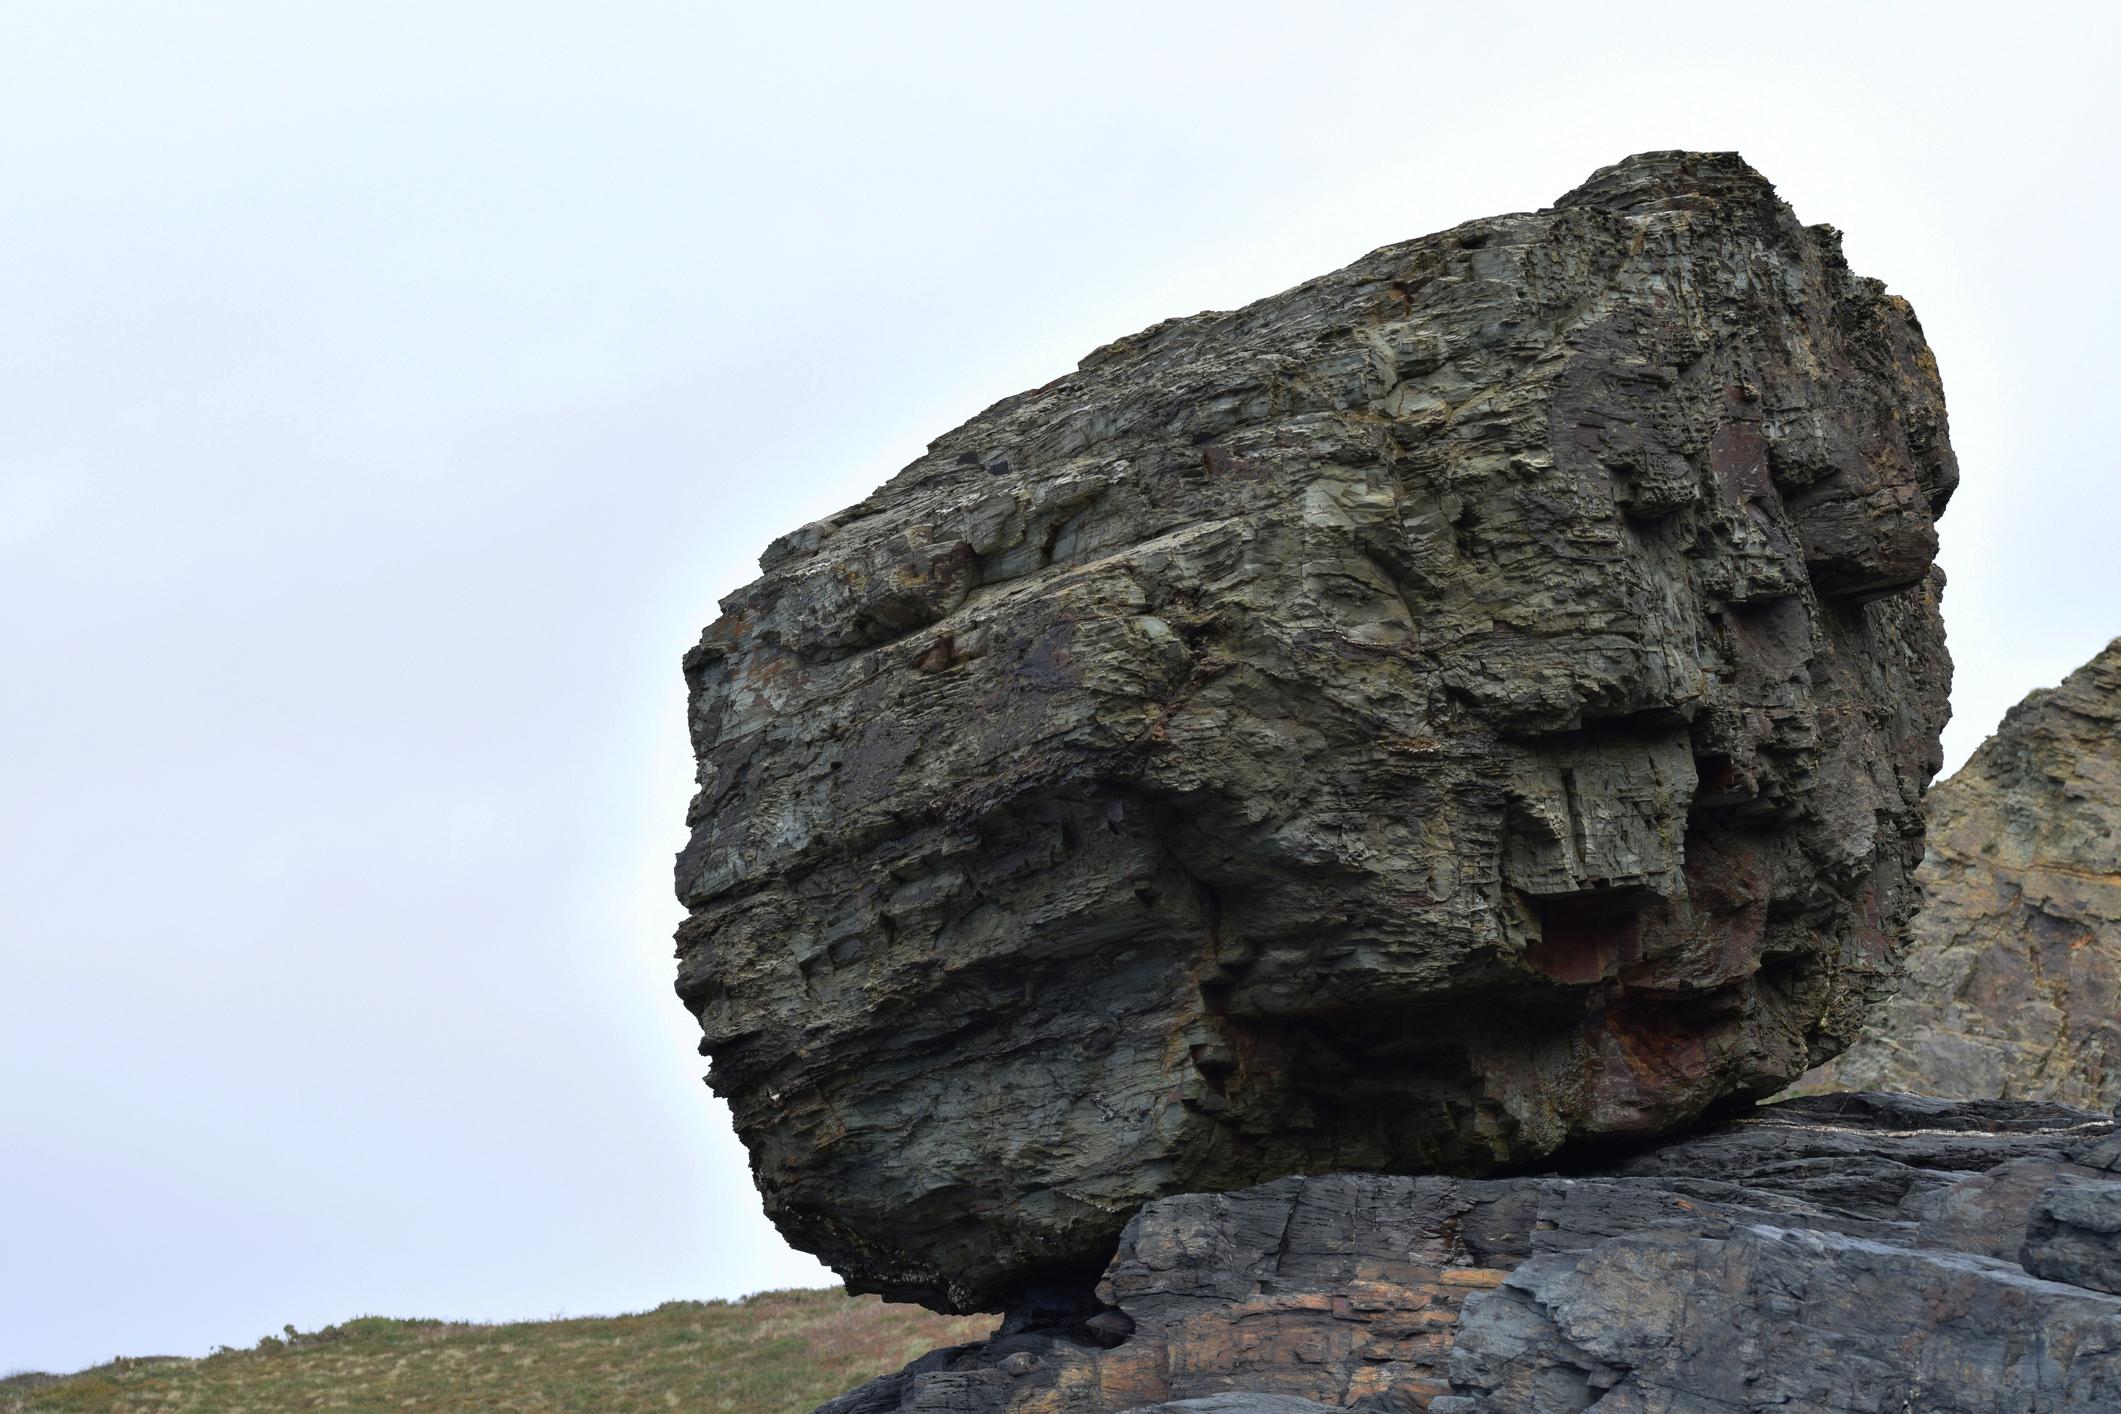 A large rock on a hillside.